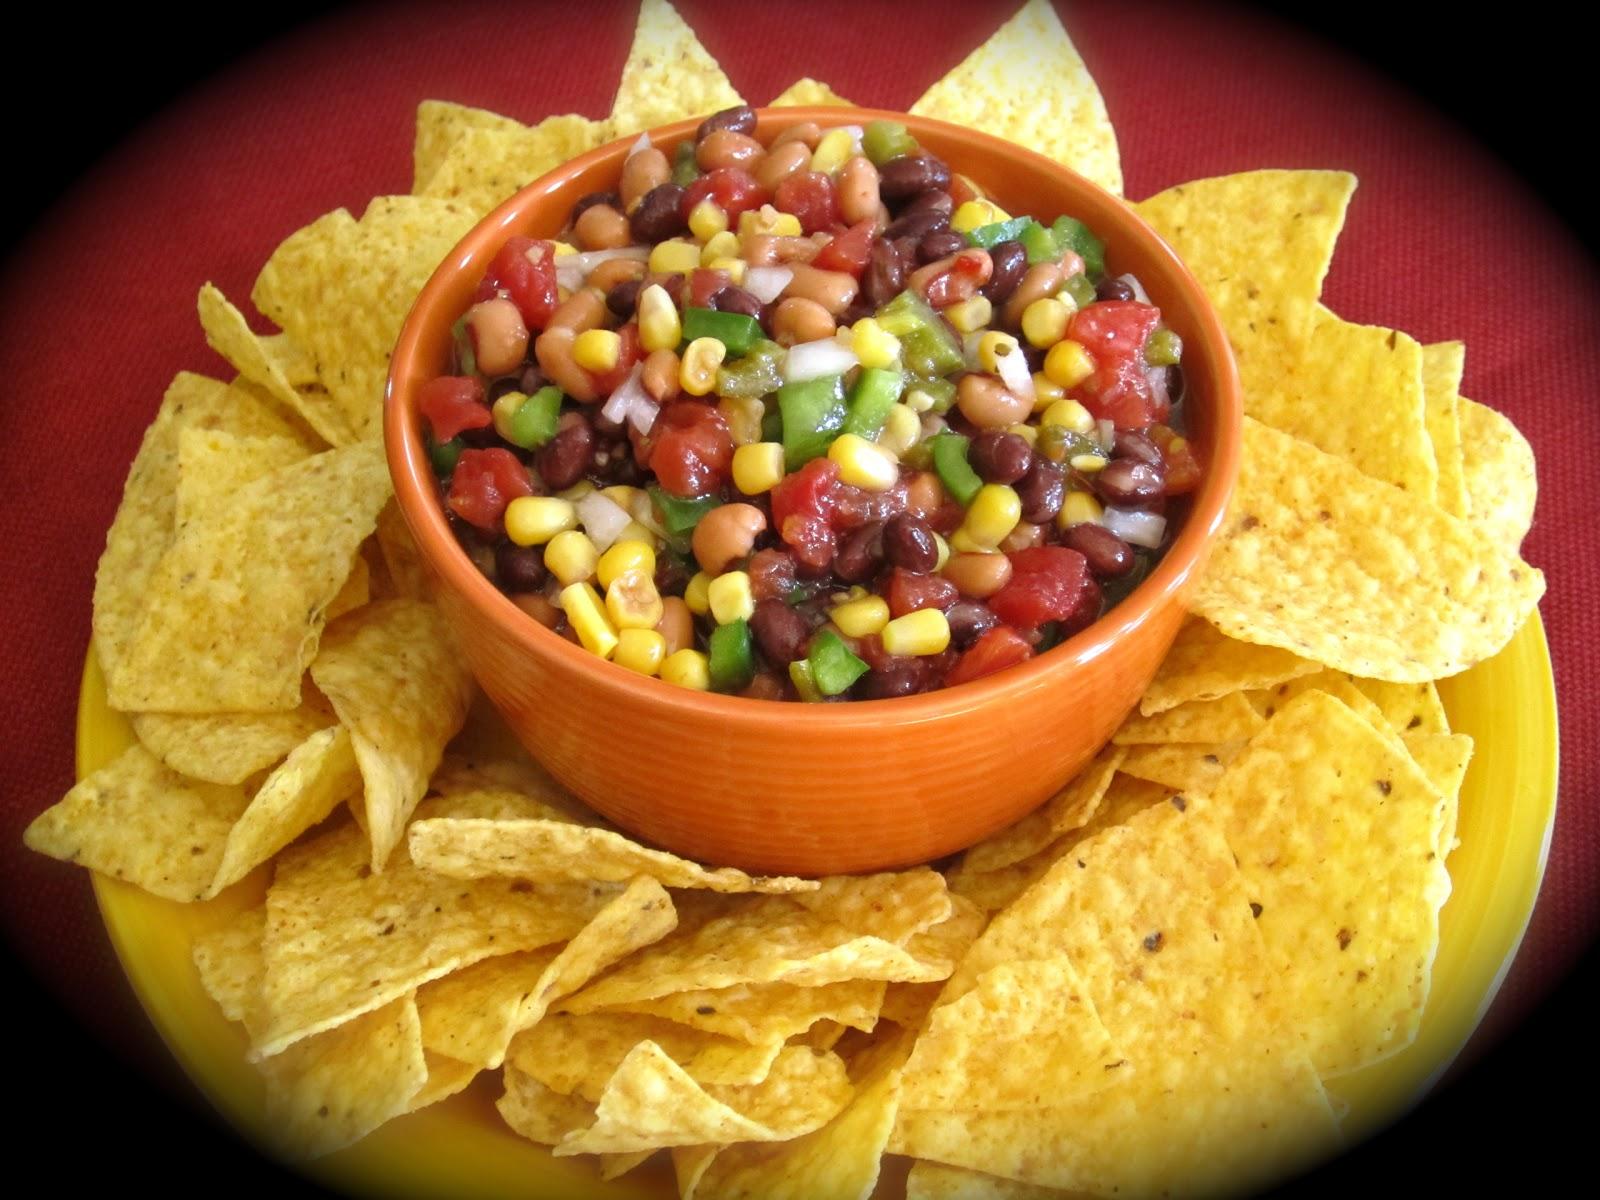 ... Friday's Restaurant Copycat Recipes: Black Eyed Peas and Corn Salsa